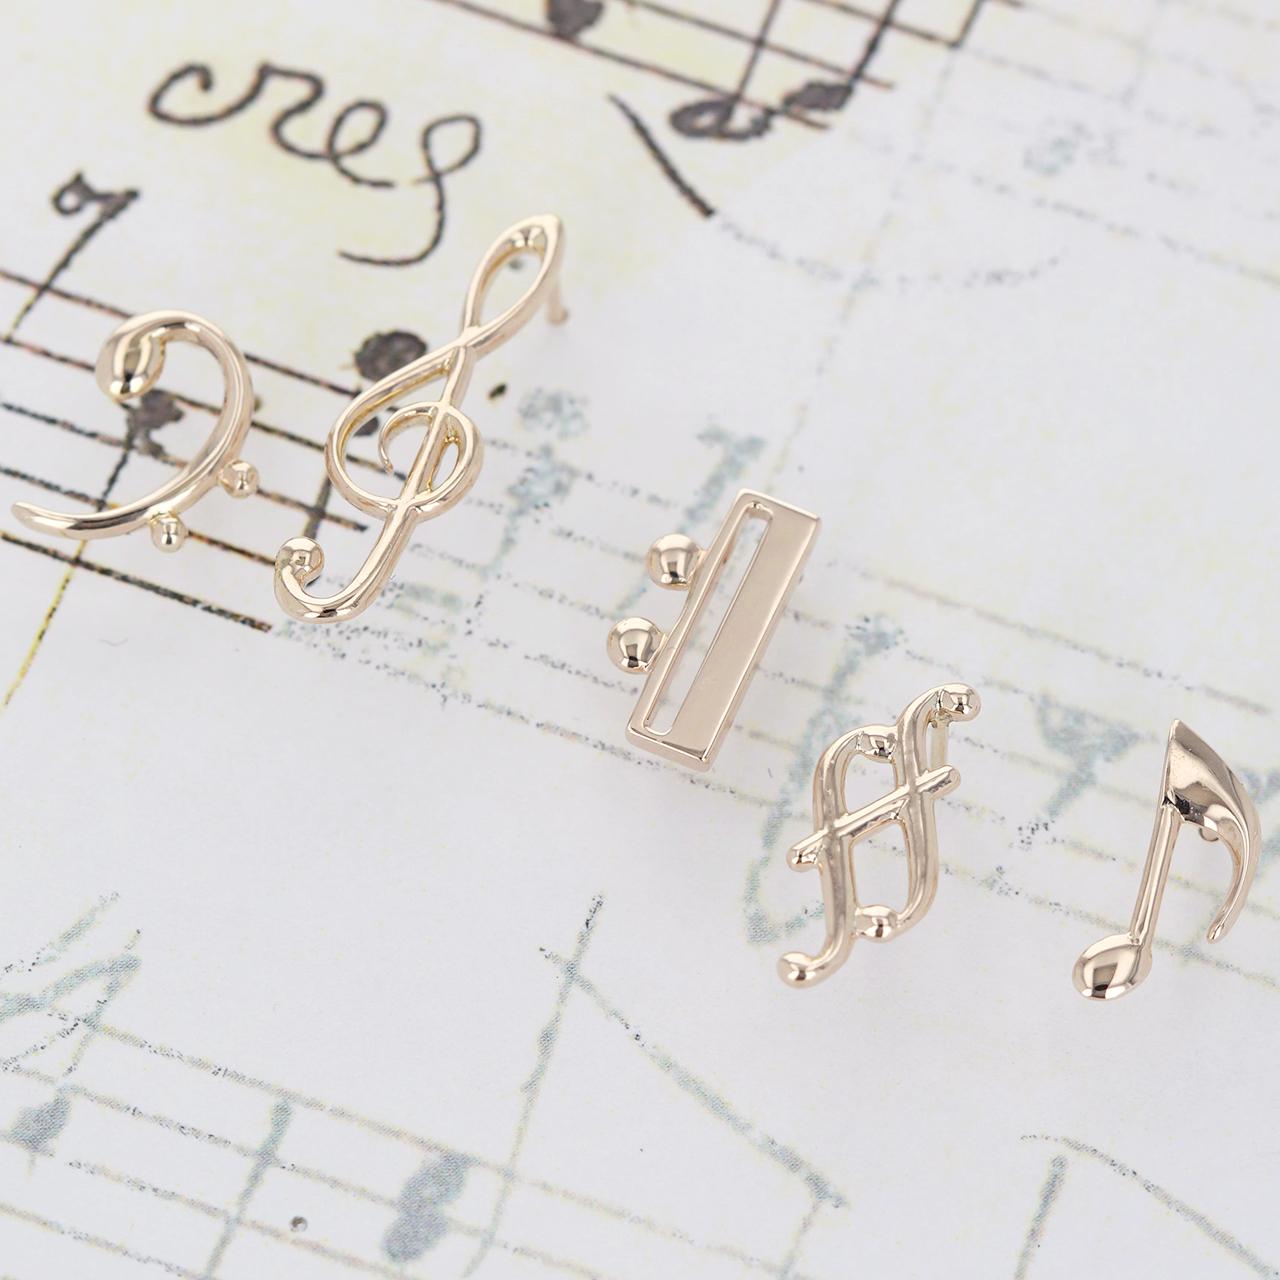 K10 / ピアス (片耳) / 音符のデザイン 少し大きくピアスシリーズ(5本セット)